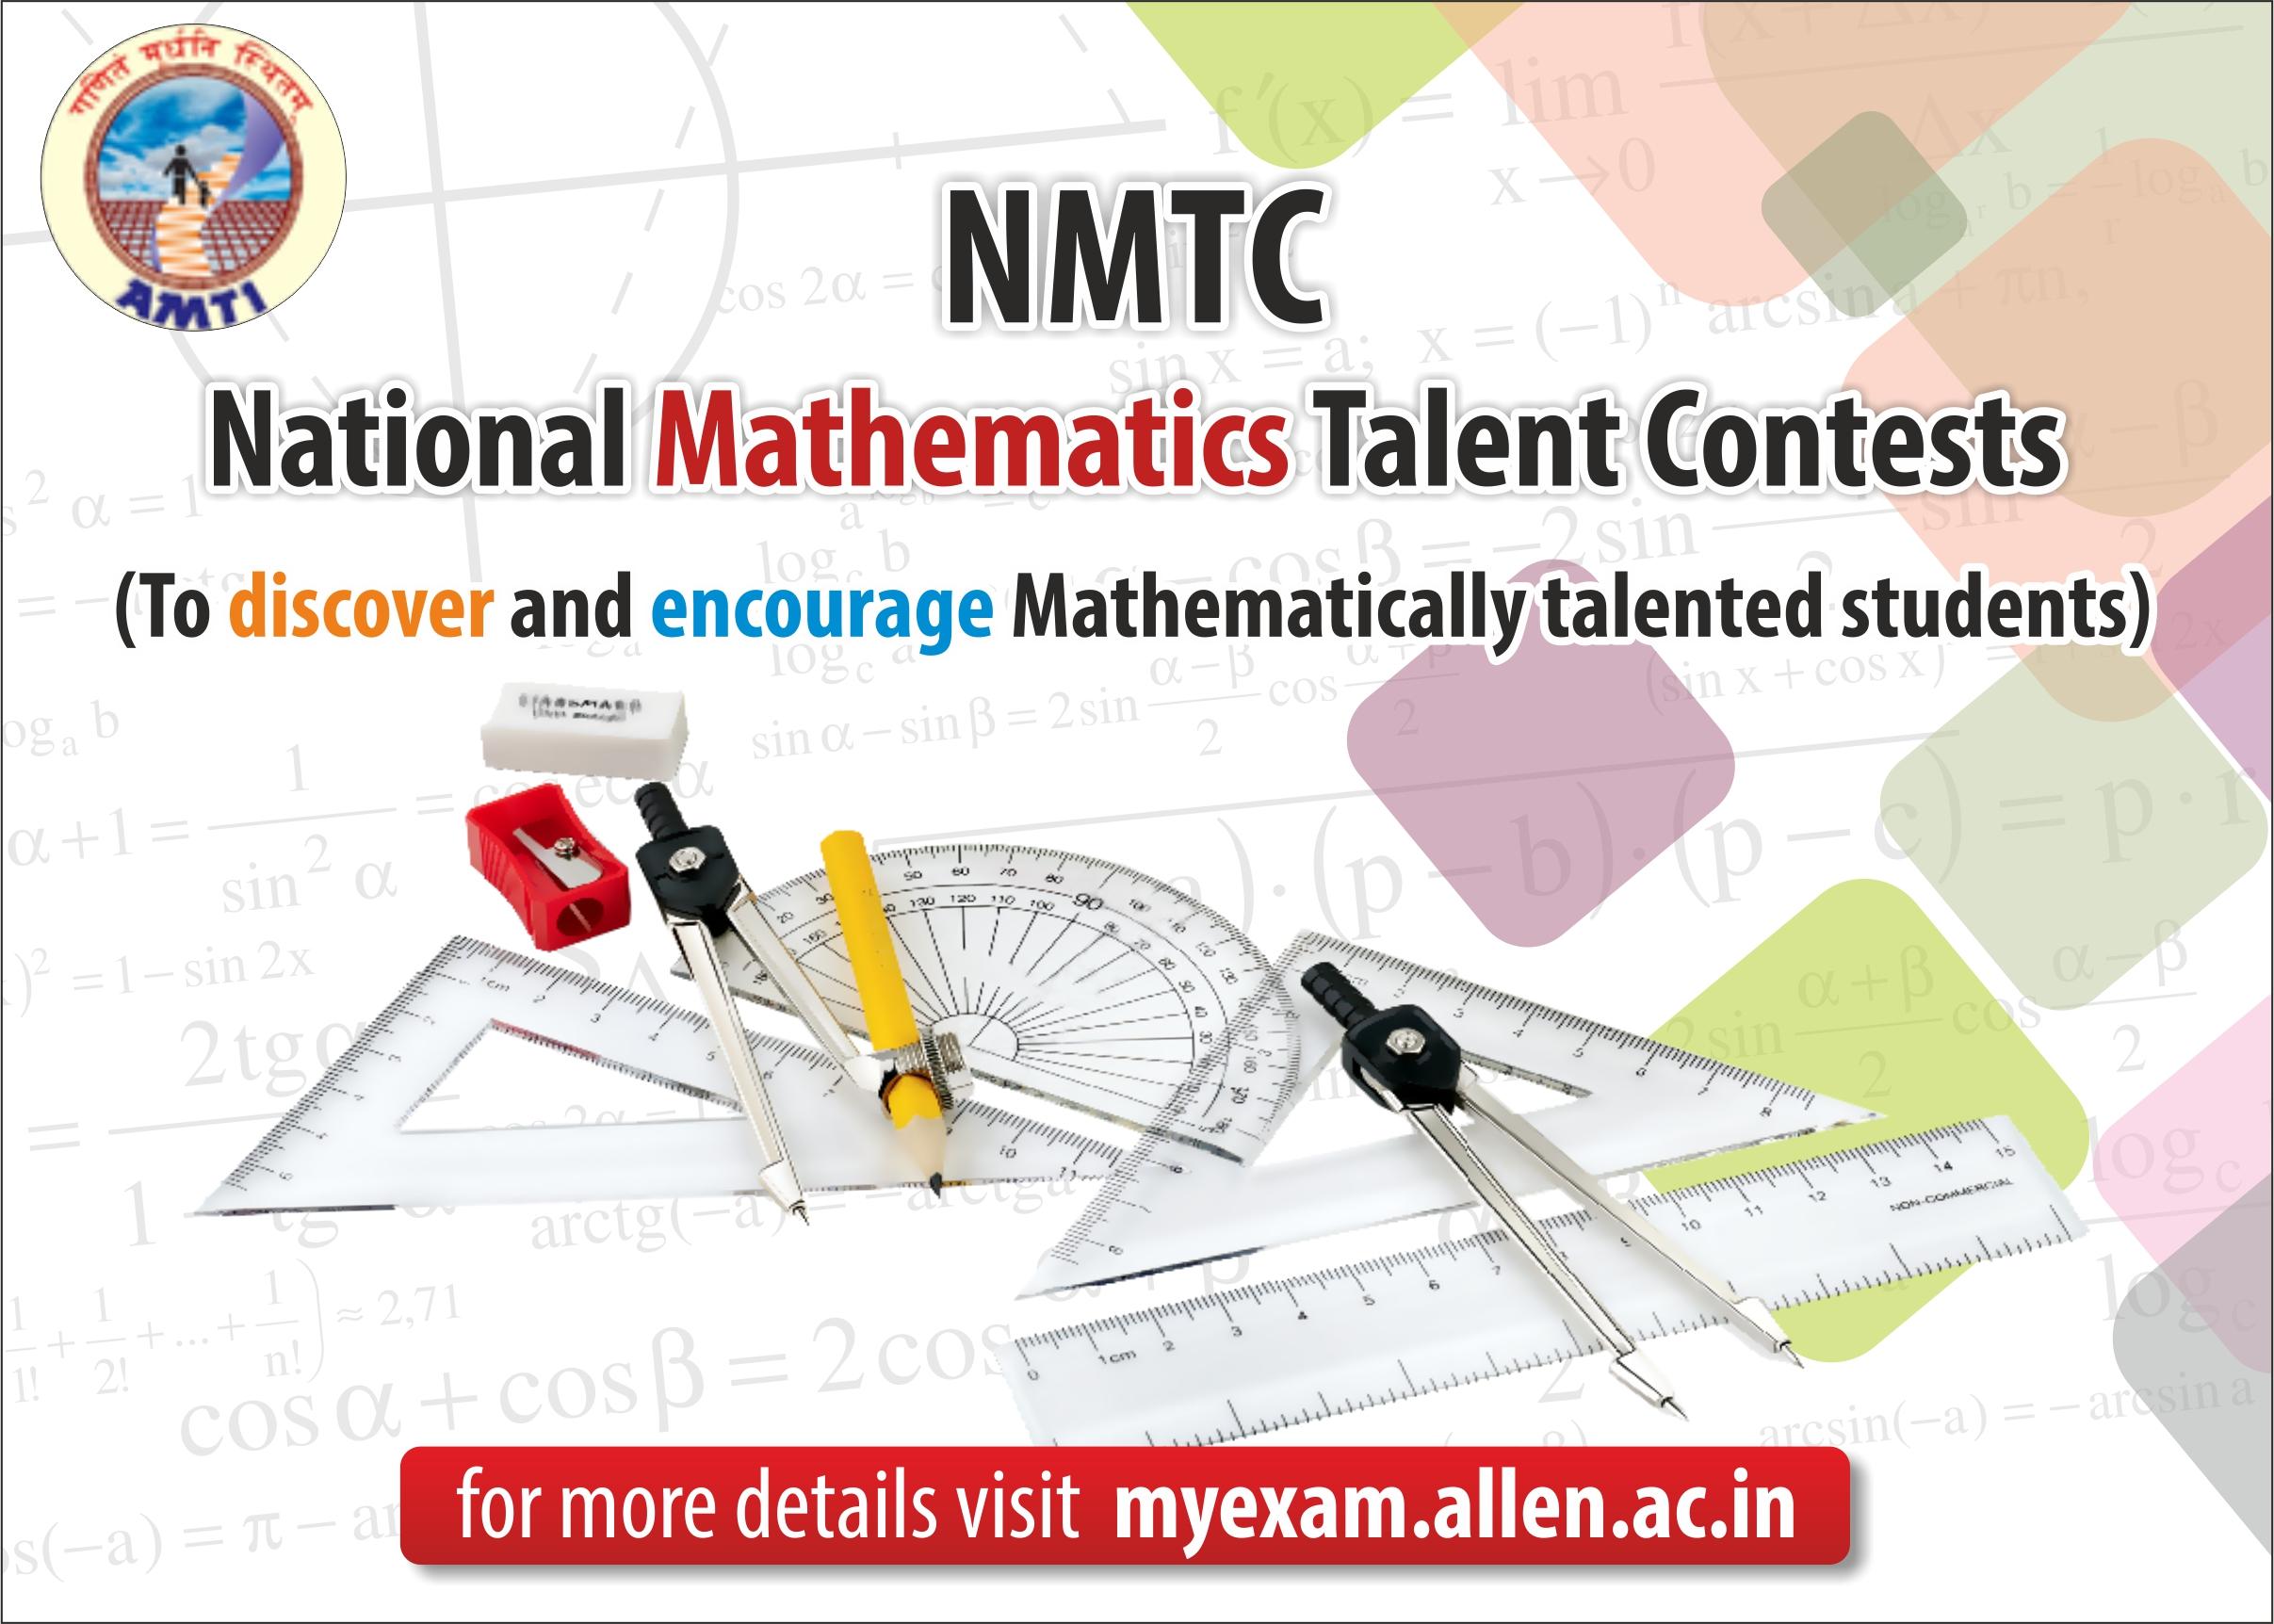 National Mathematics Talent Contents